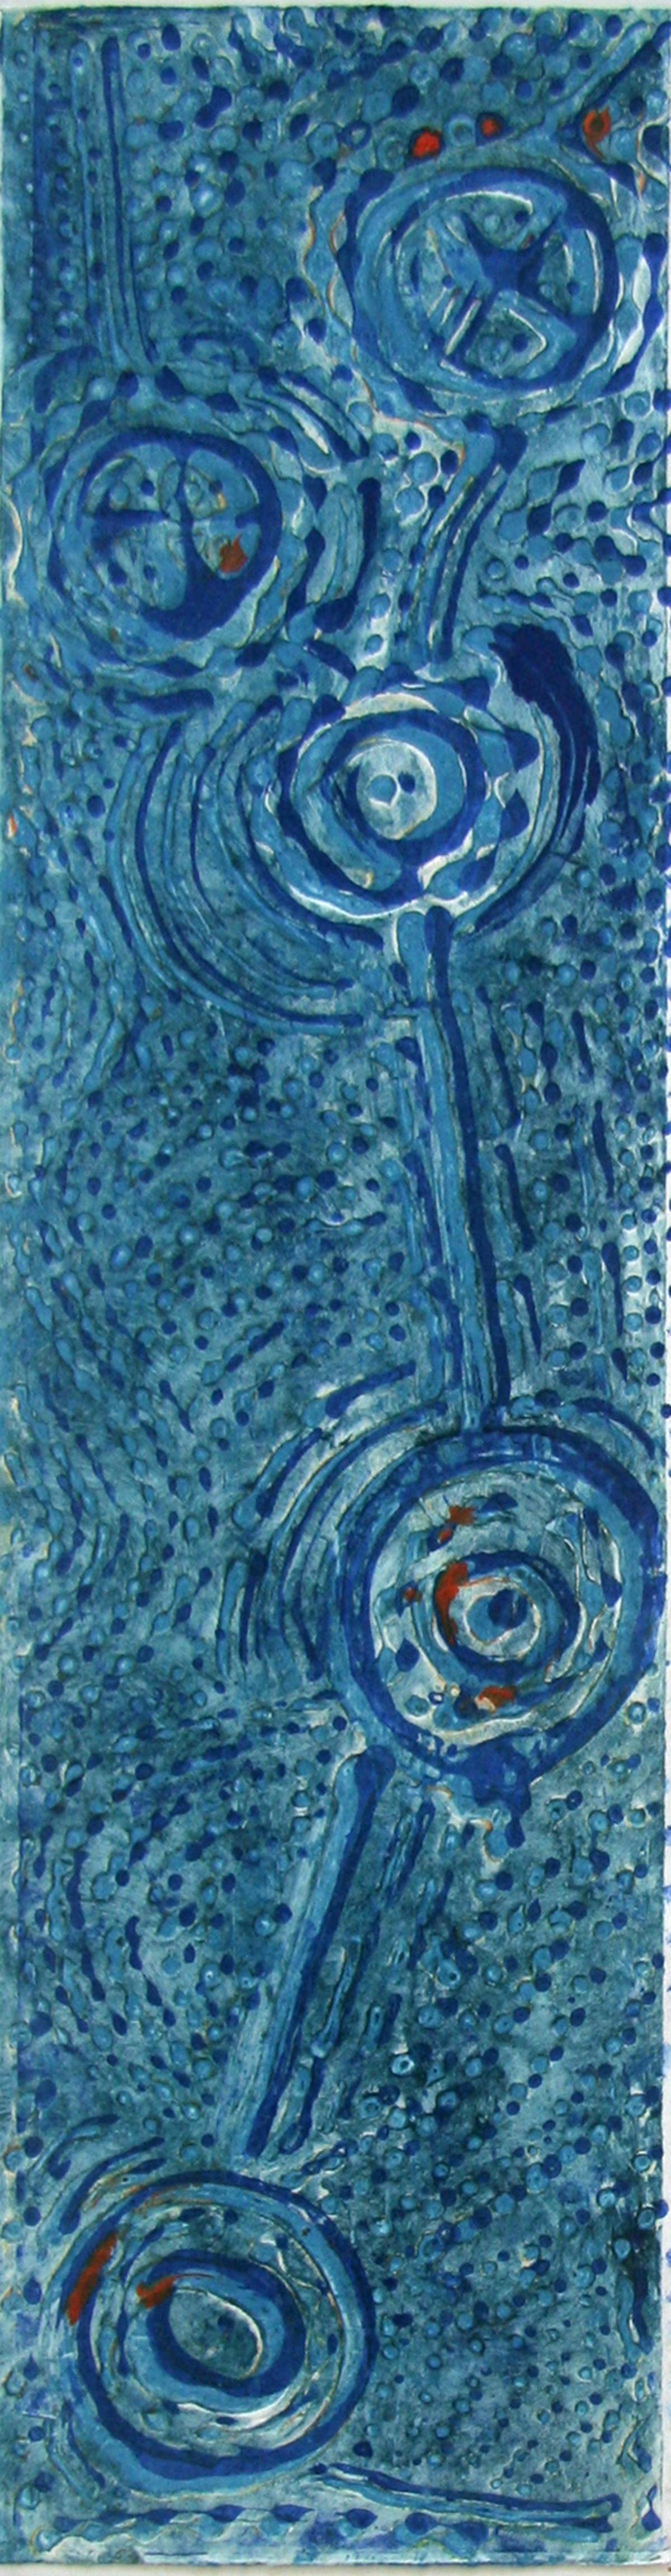 "Blue Water Holes   Collograph prints  6"" x 24""  2016"